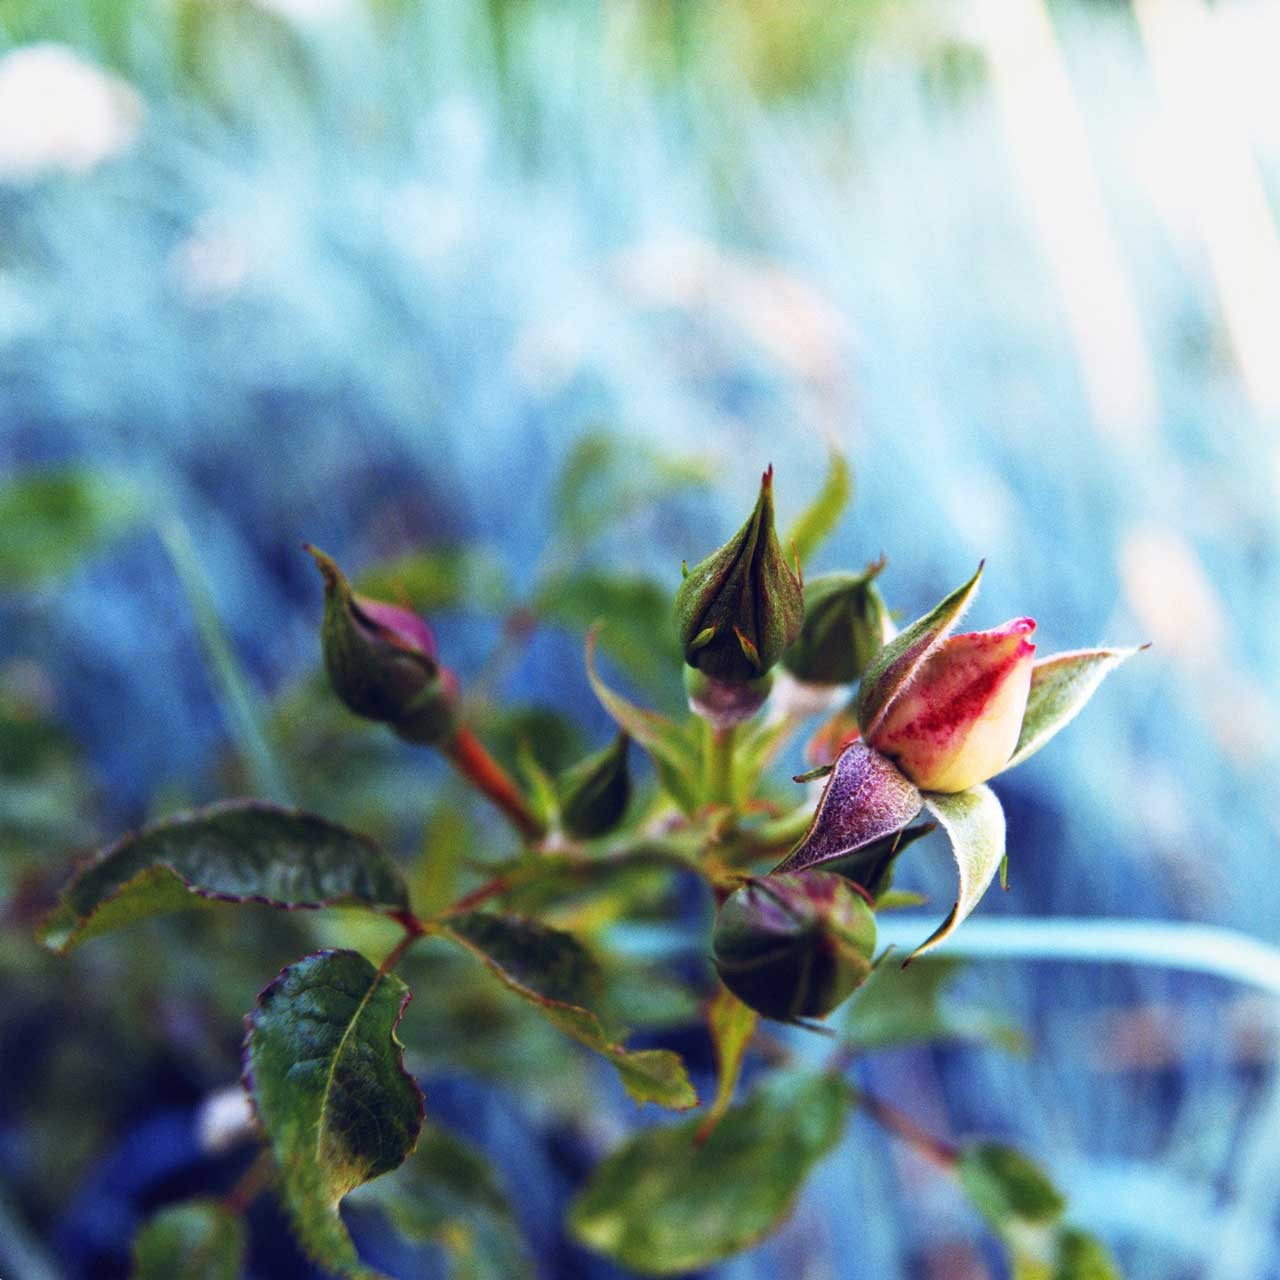 Laure-Maud_01_photographe_jardin-fleur-rose_1